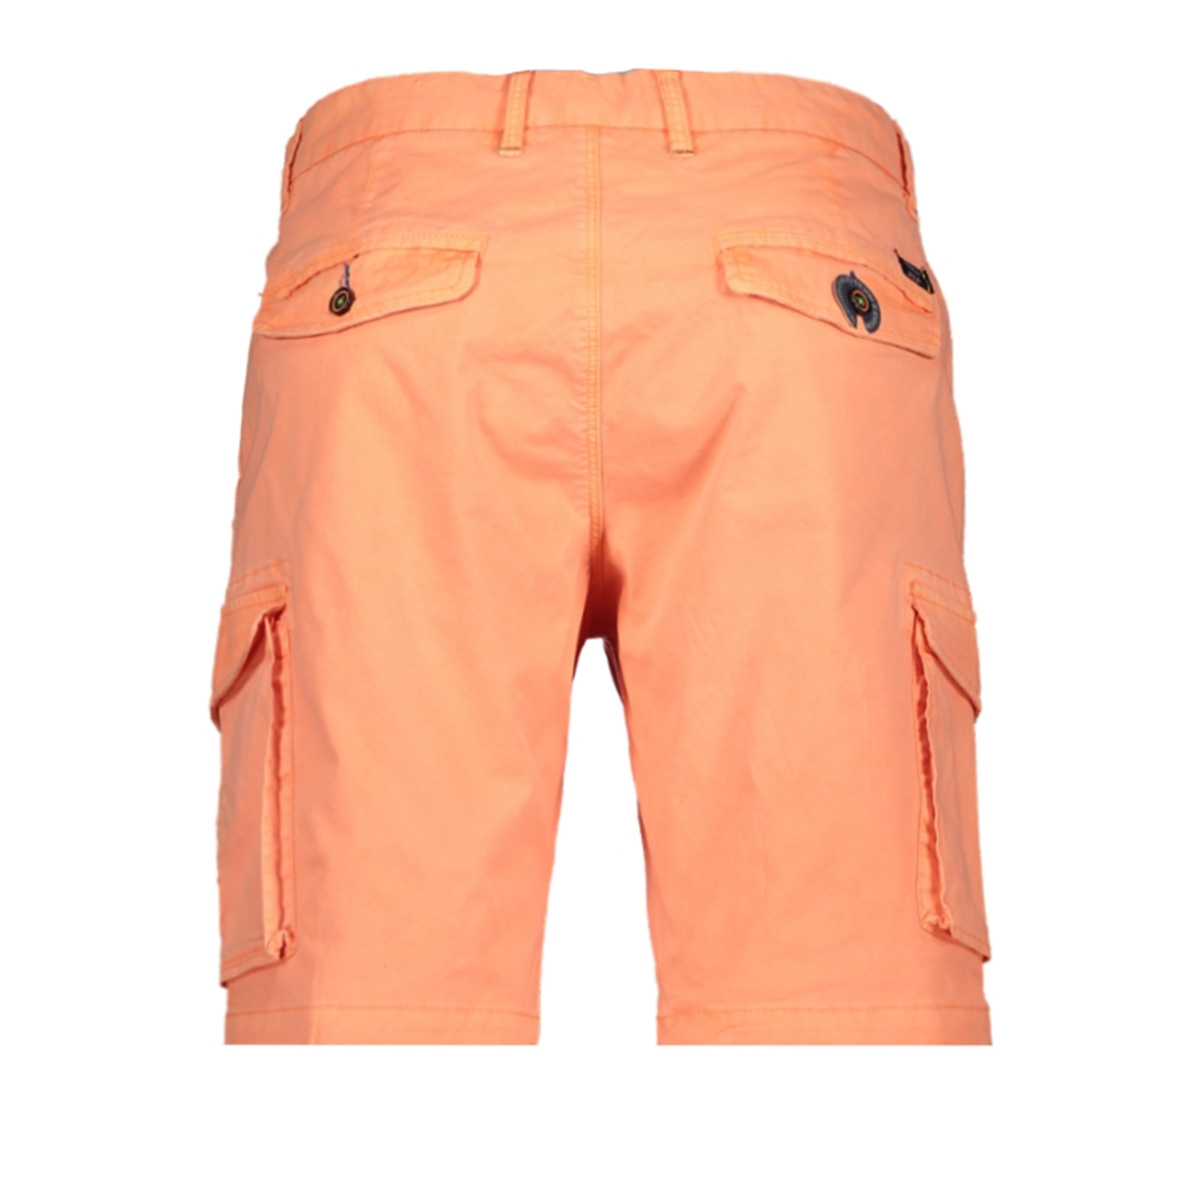 20cn625 mission bay nza korte broek 641 peach orange